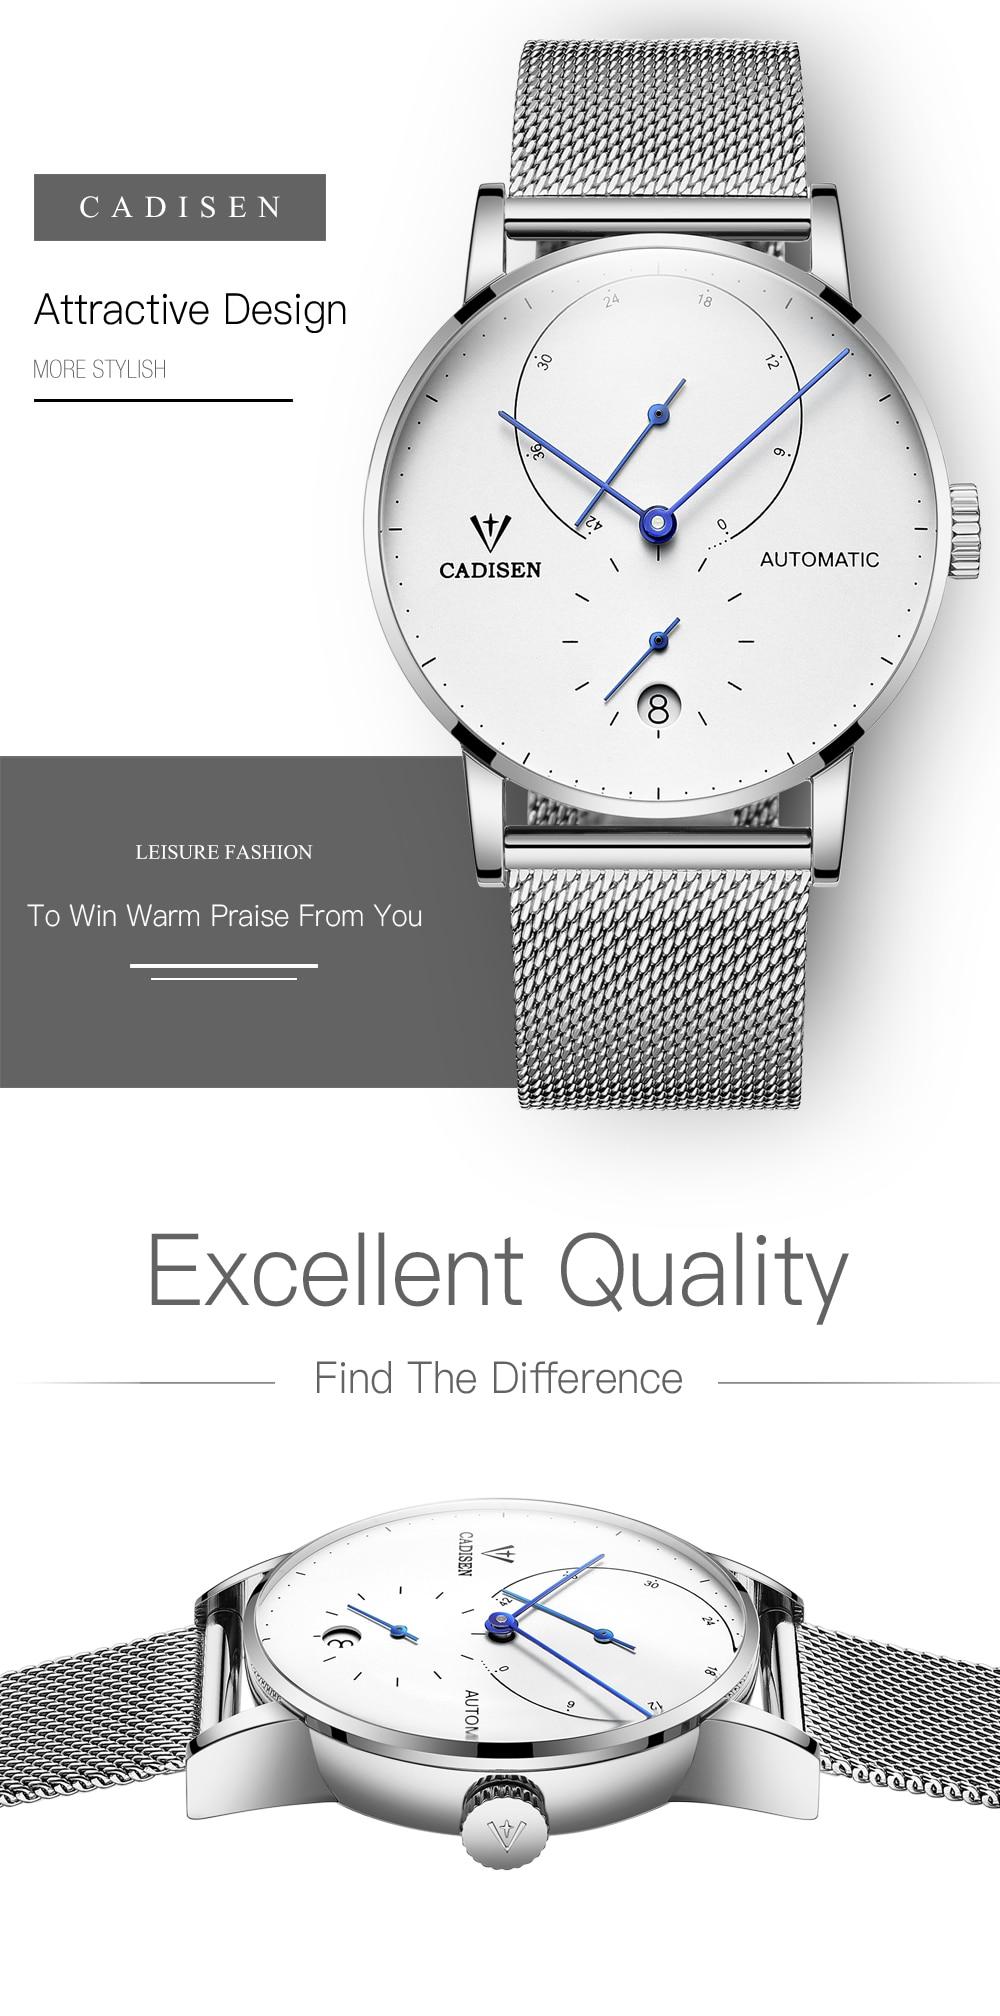 HTB1h SXk77mBKNjSZFyq6zydFXaO CADISEN Top Mens Watches Top Brand Luxury Automatic Mechanical Watch Men Full Steel Business Waterproof Fashion Sport Watches